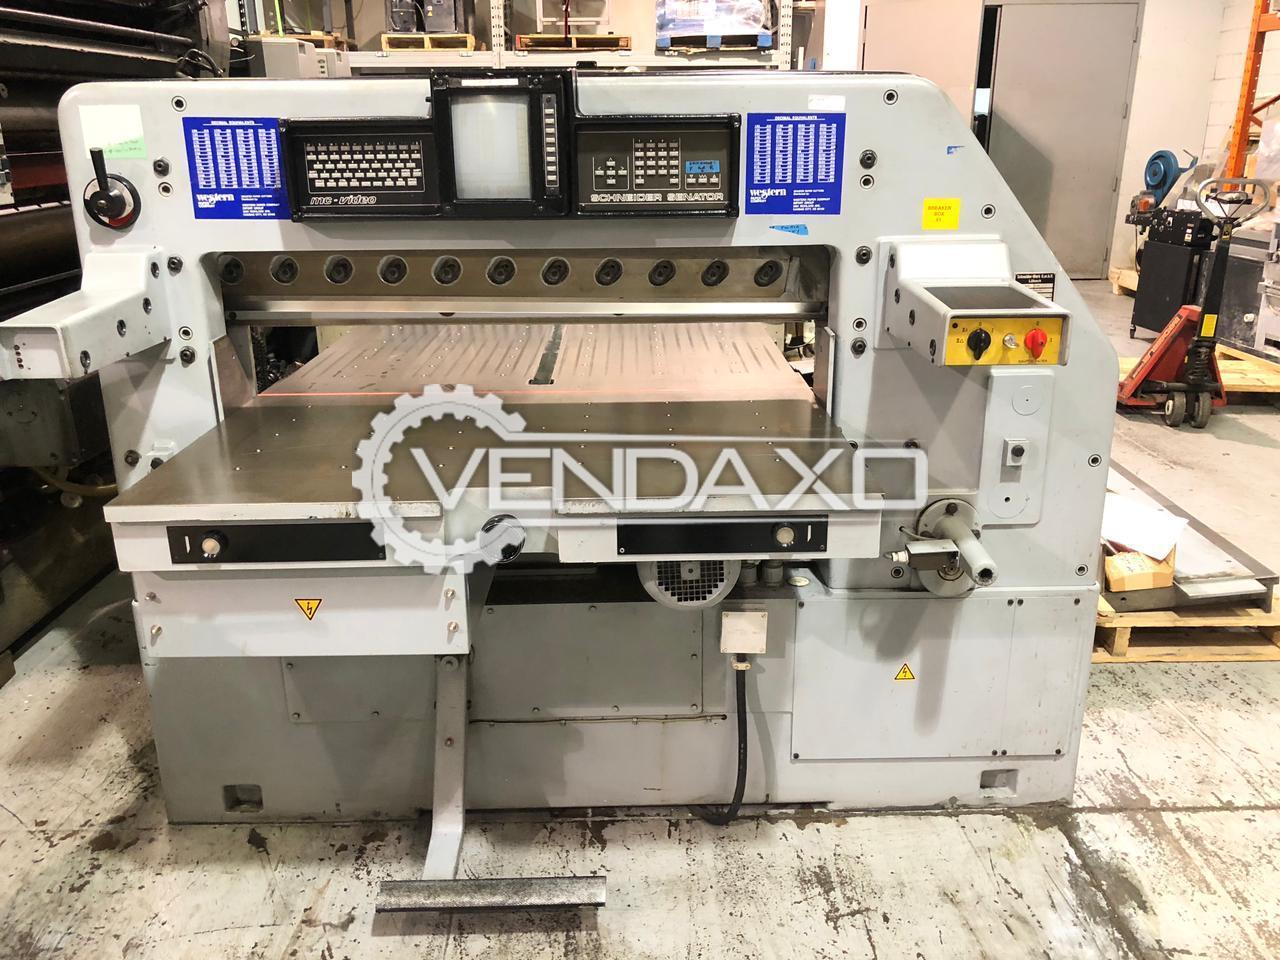 Schneider Senator 115 Paper Cutting Machine - 45 Inch